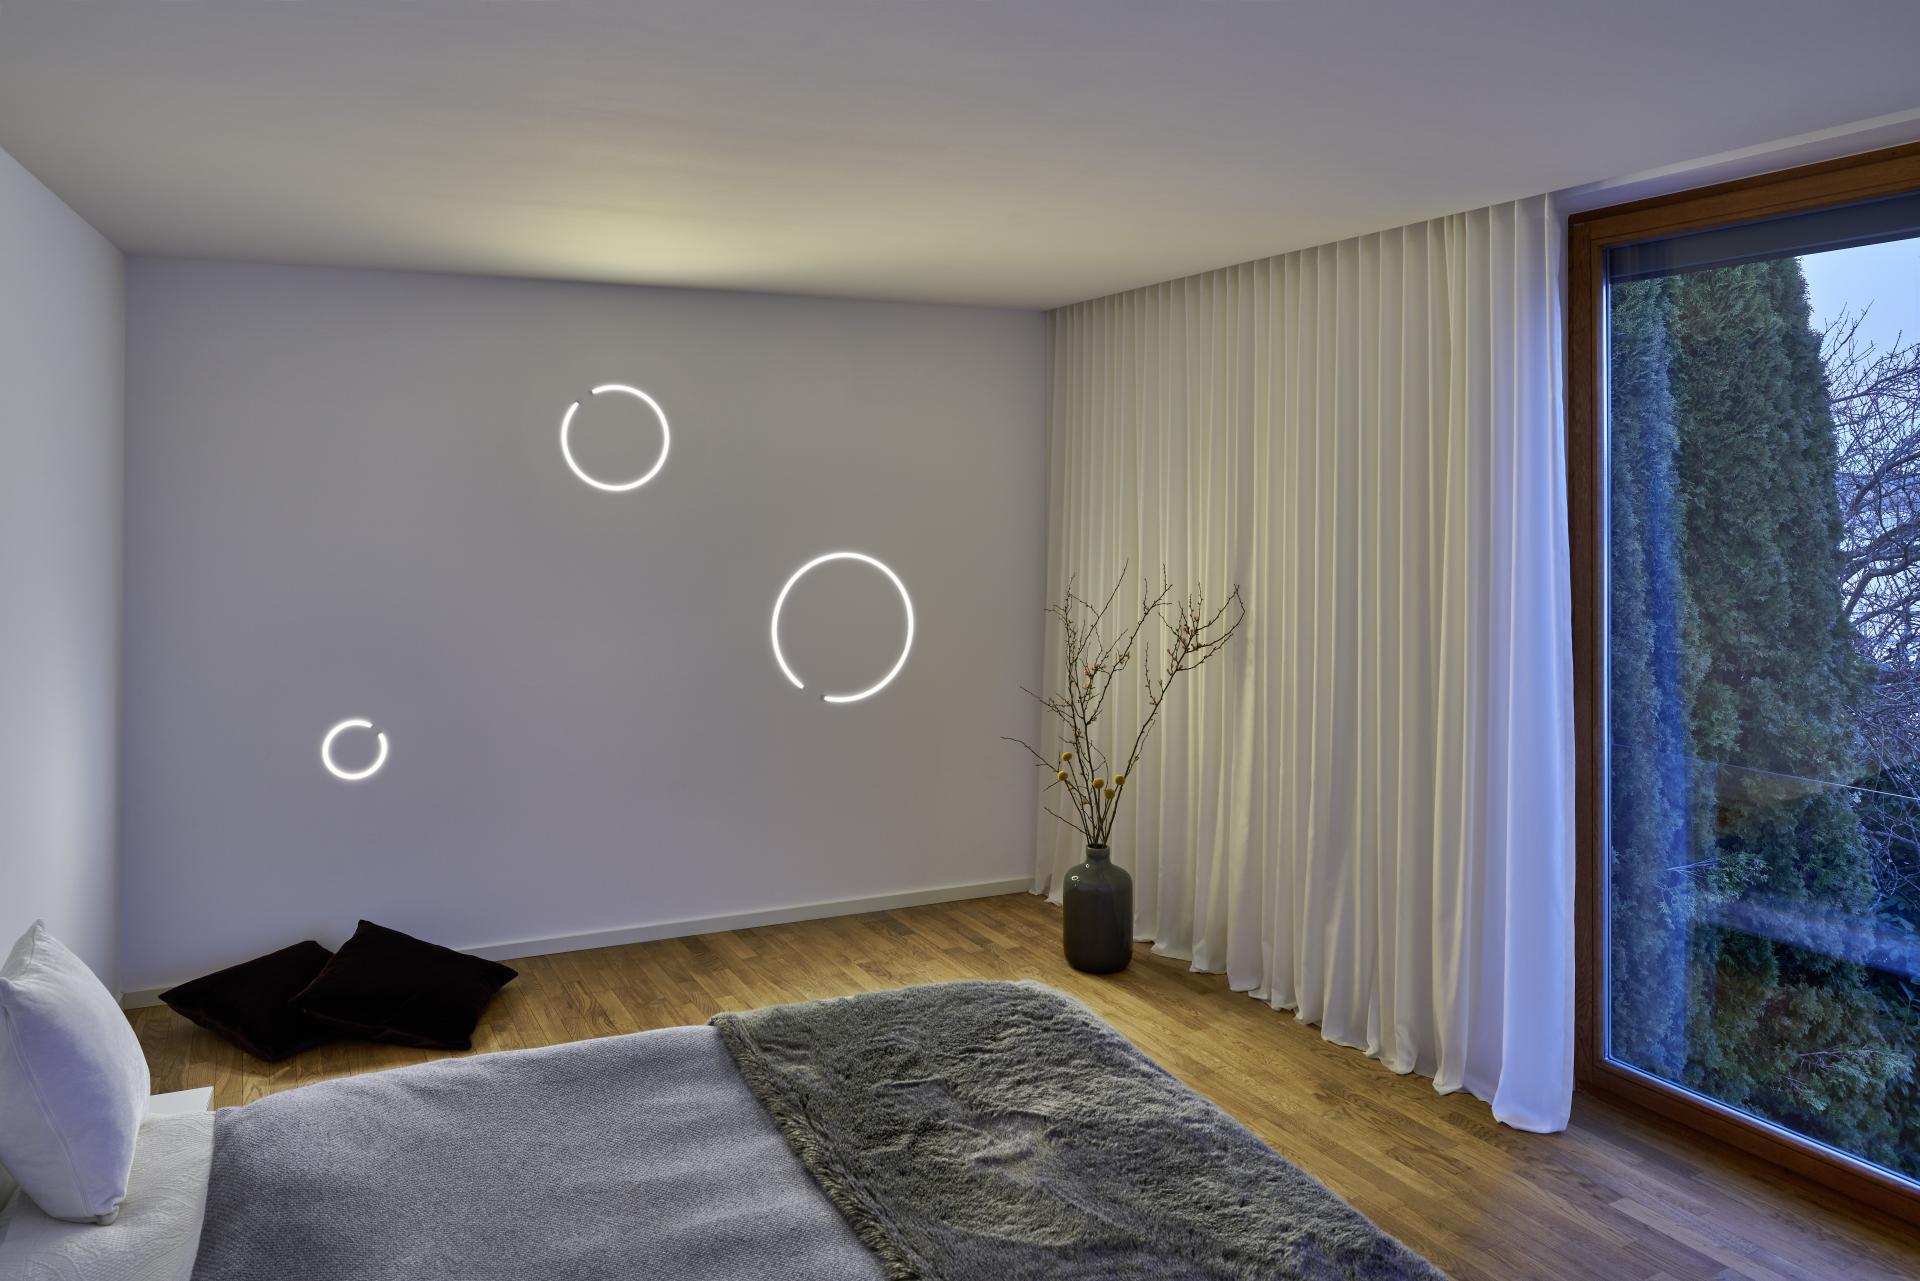 bedroom Lighting - Asco Lights